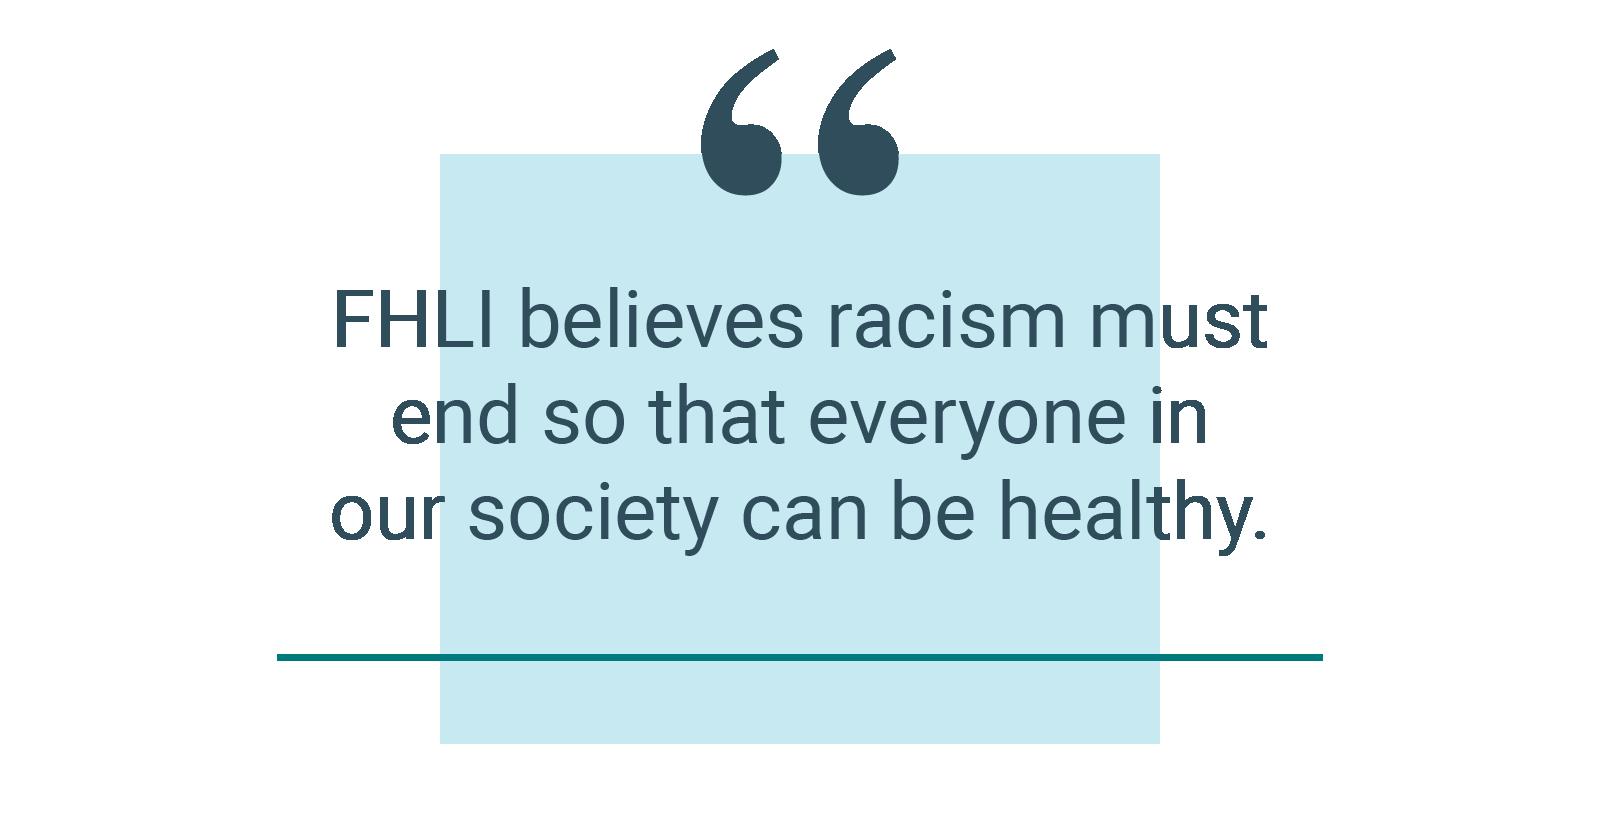 FHLI Statement Against Racism